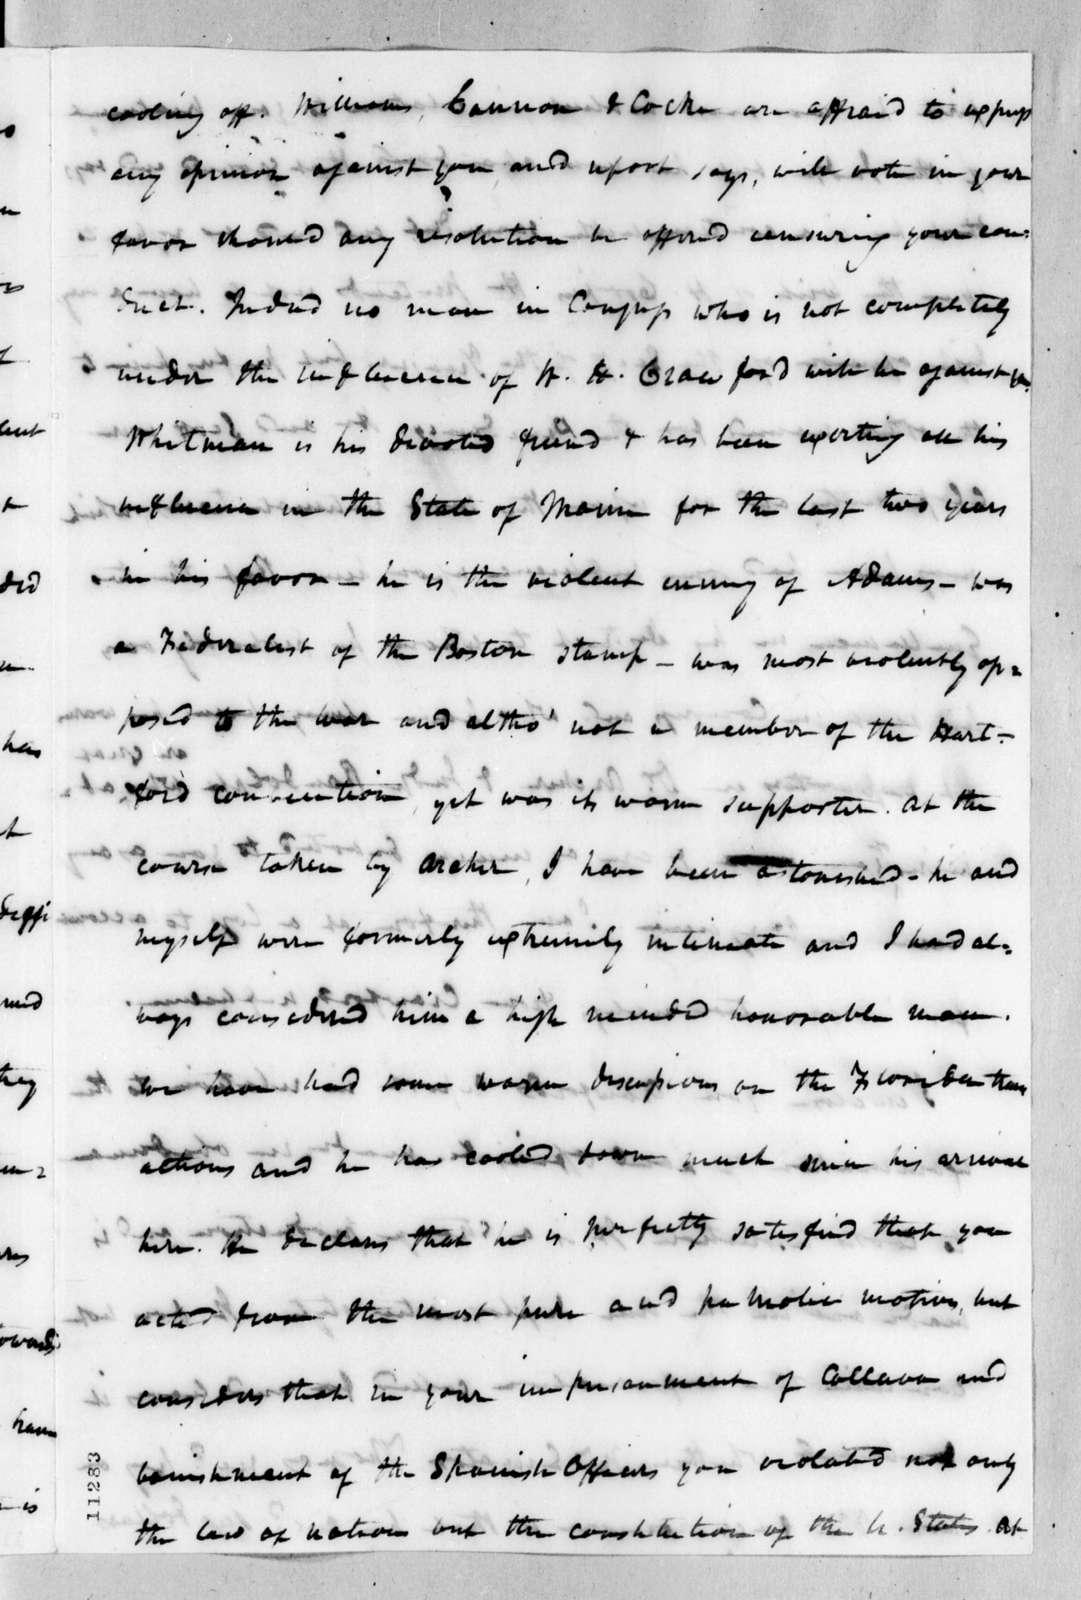 James Craine Bronaugh to Andrew Jackson, February 8, 1822